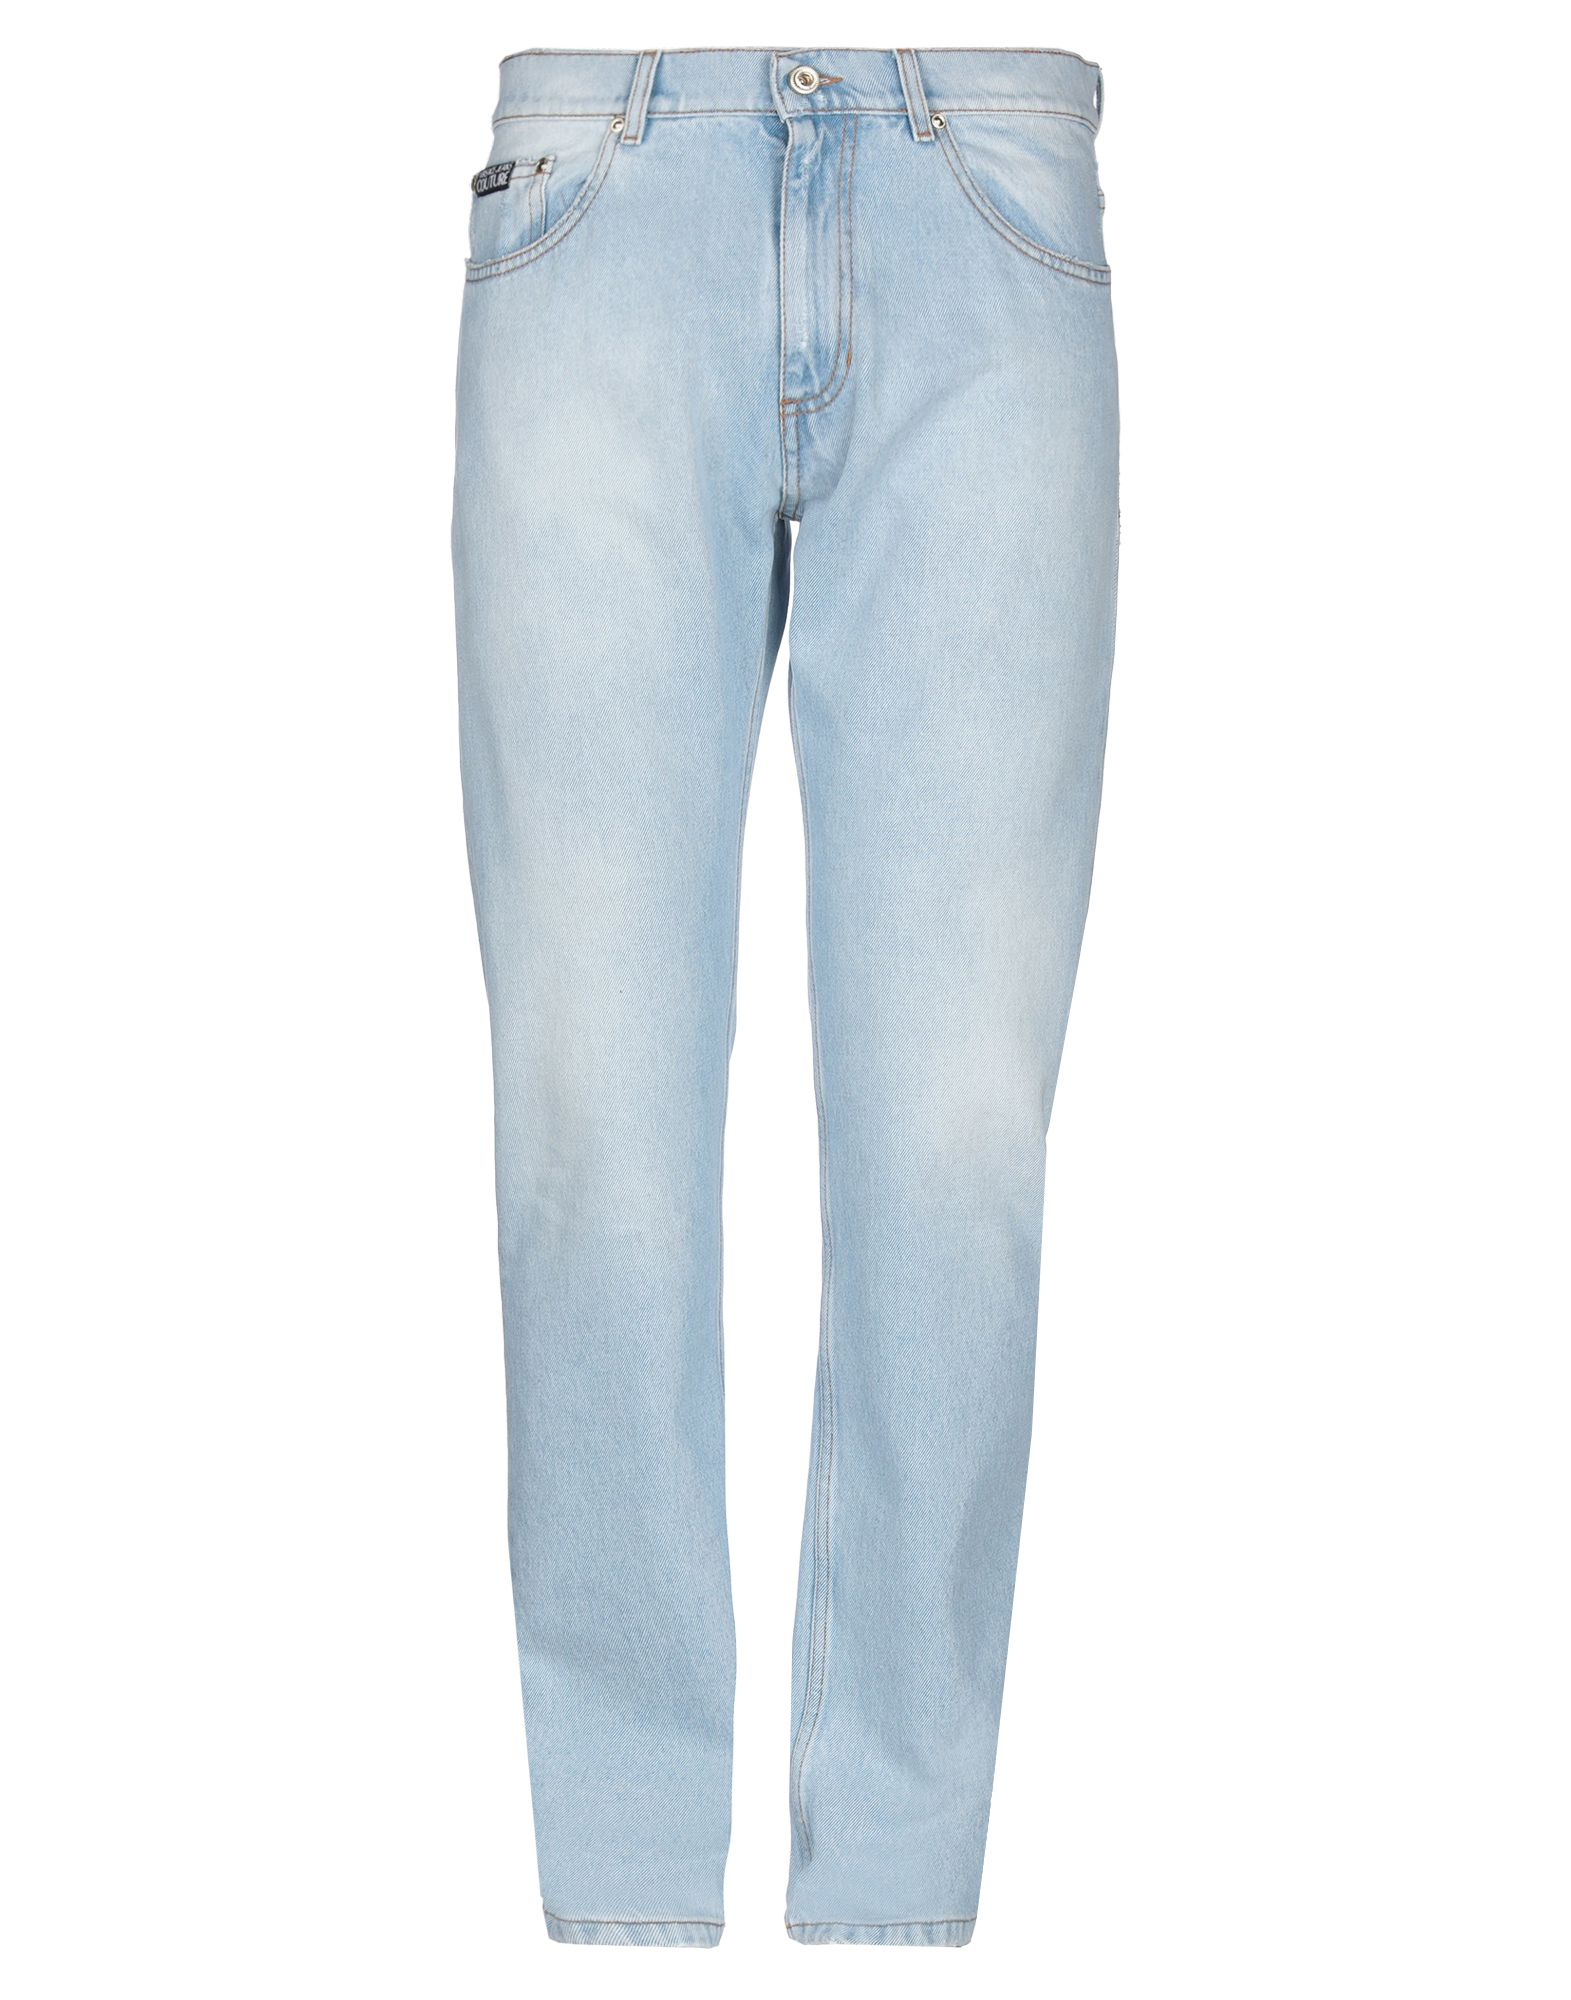 versace gianni versace couture VERSACE JEANS COUTURE Джинсовые брюки